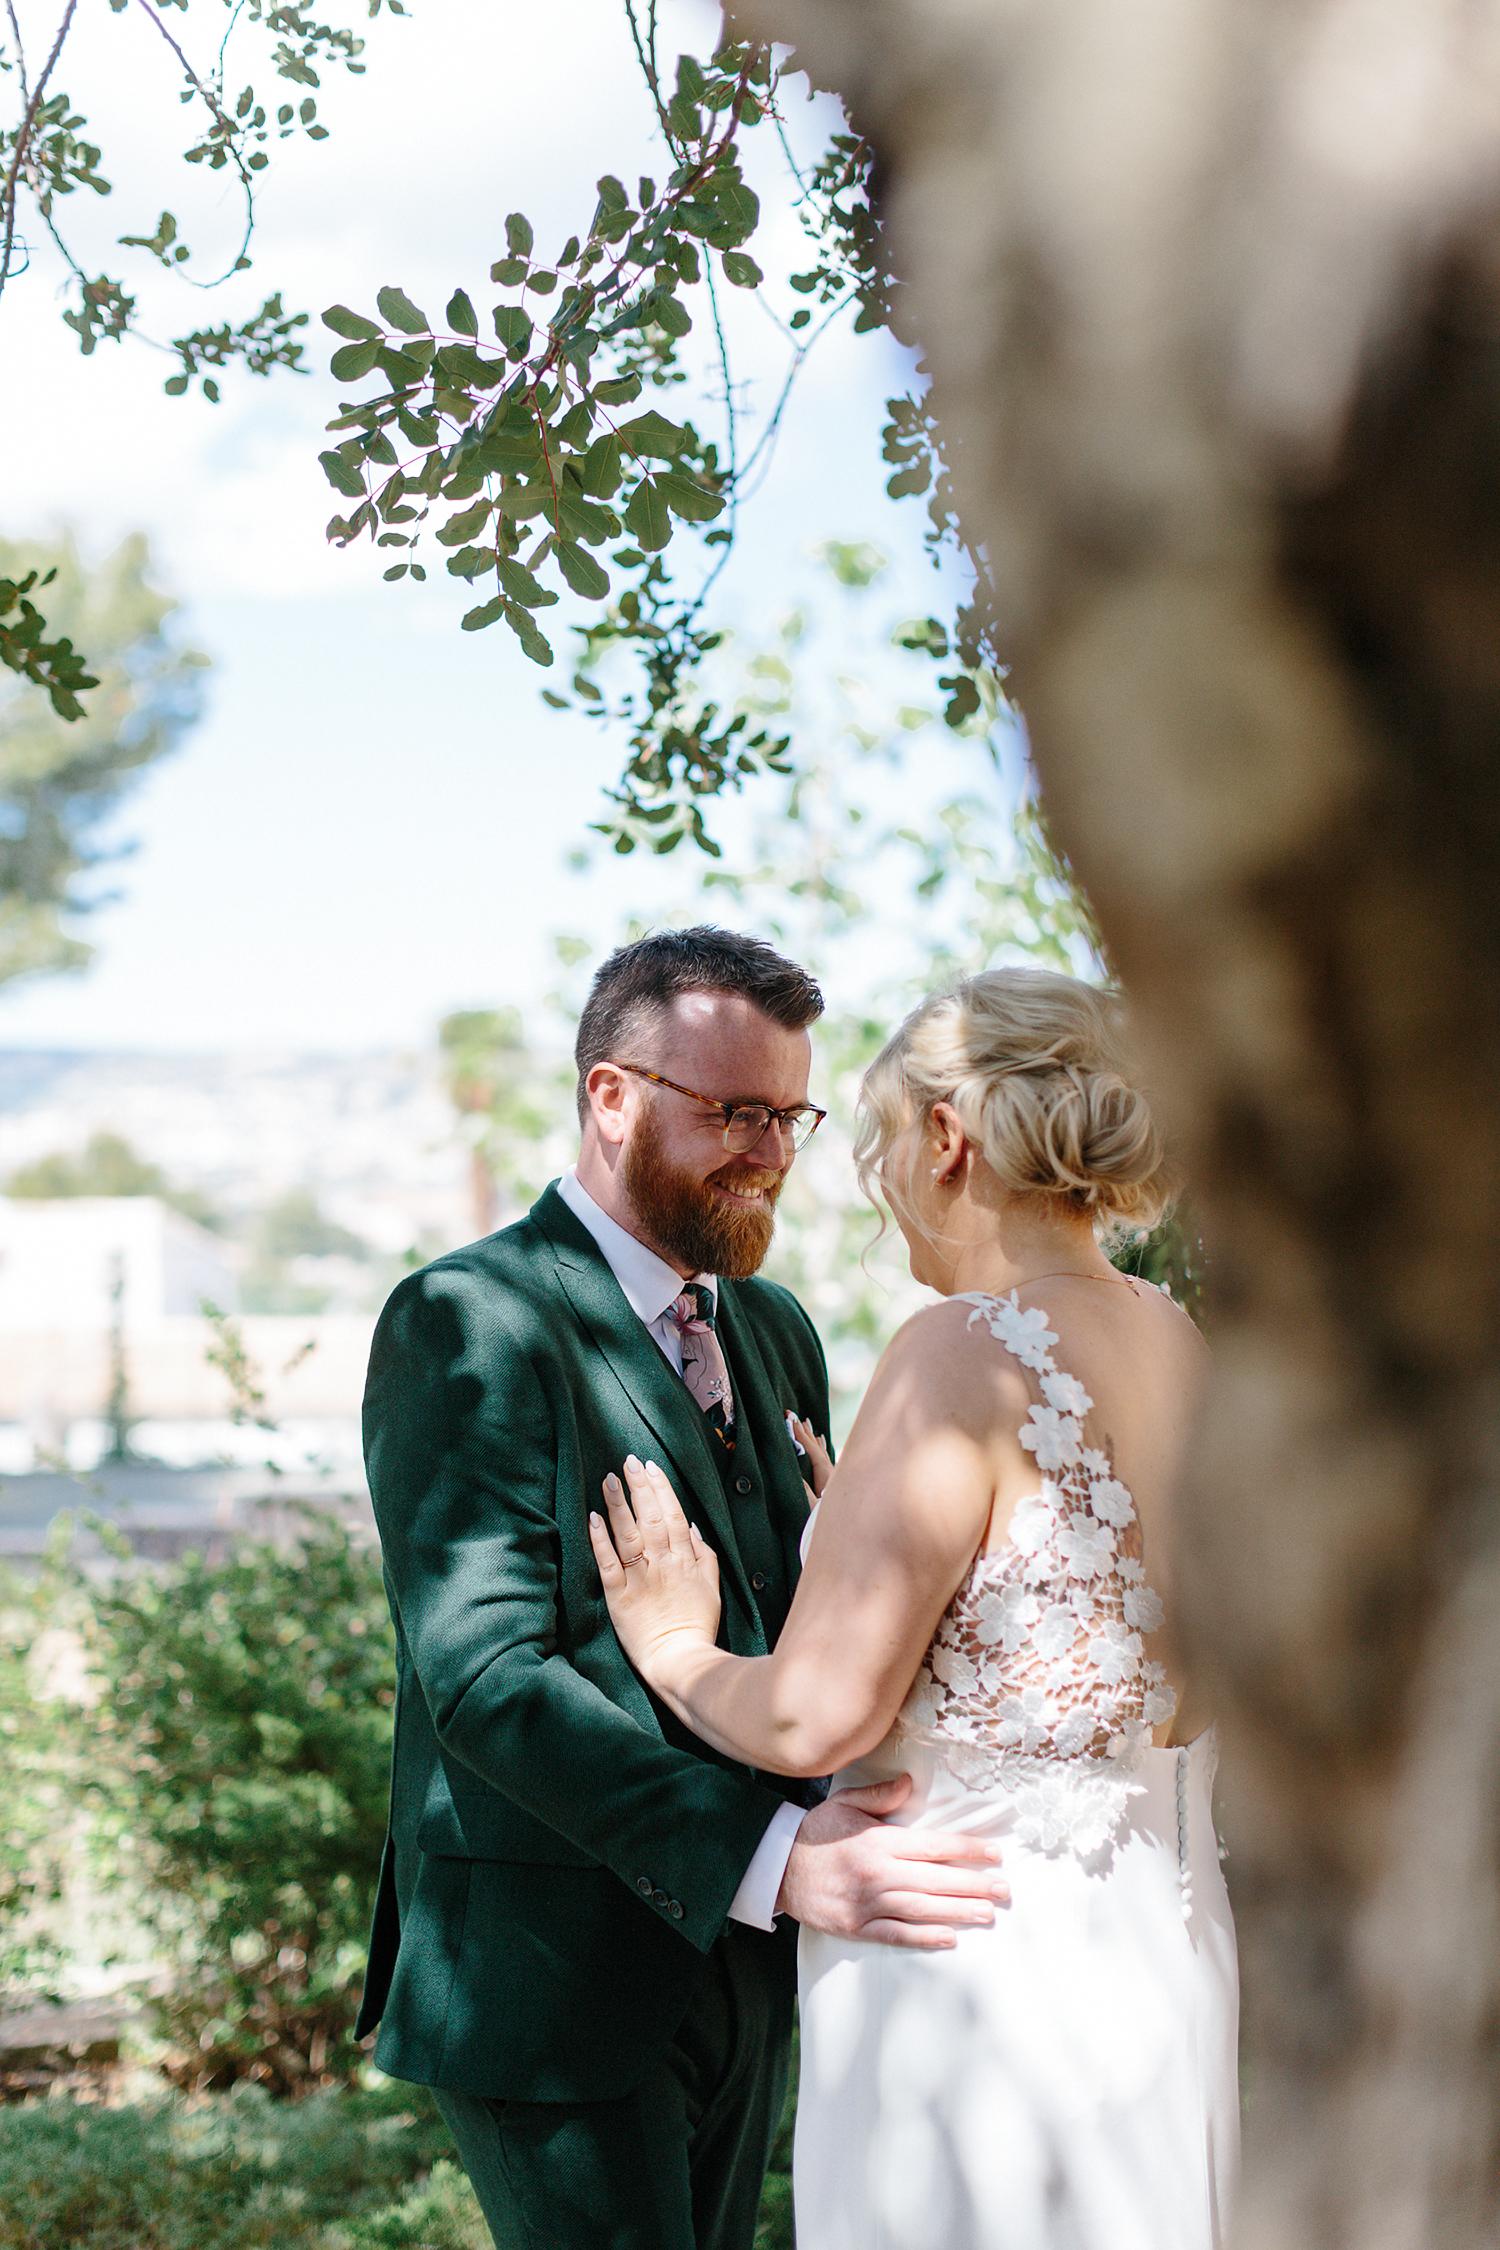 european-wedding-spain-wedding-photographer-destination-wedding-photographer-from-toronto-ryanne-hollies-photography-documentary-editorial-style-toronto-wedding-photographer-first-look-groom-and-bride-kissing-emotional-powerful-real-love.jpg